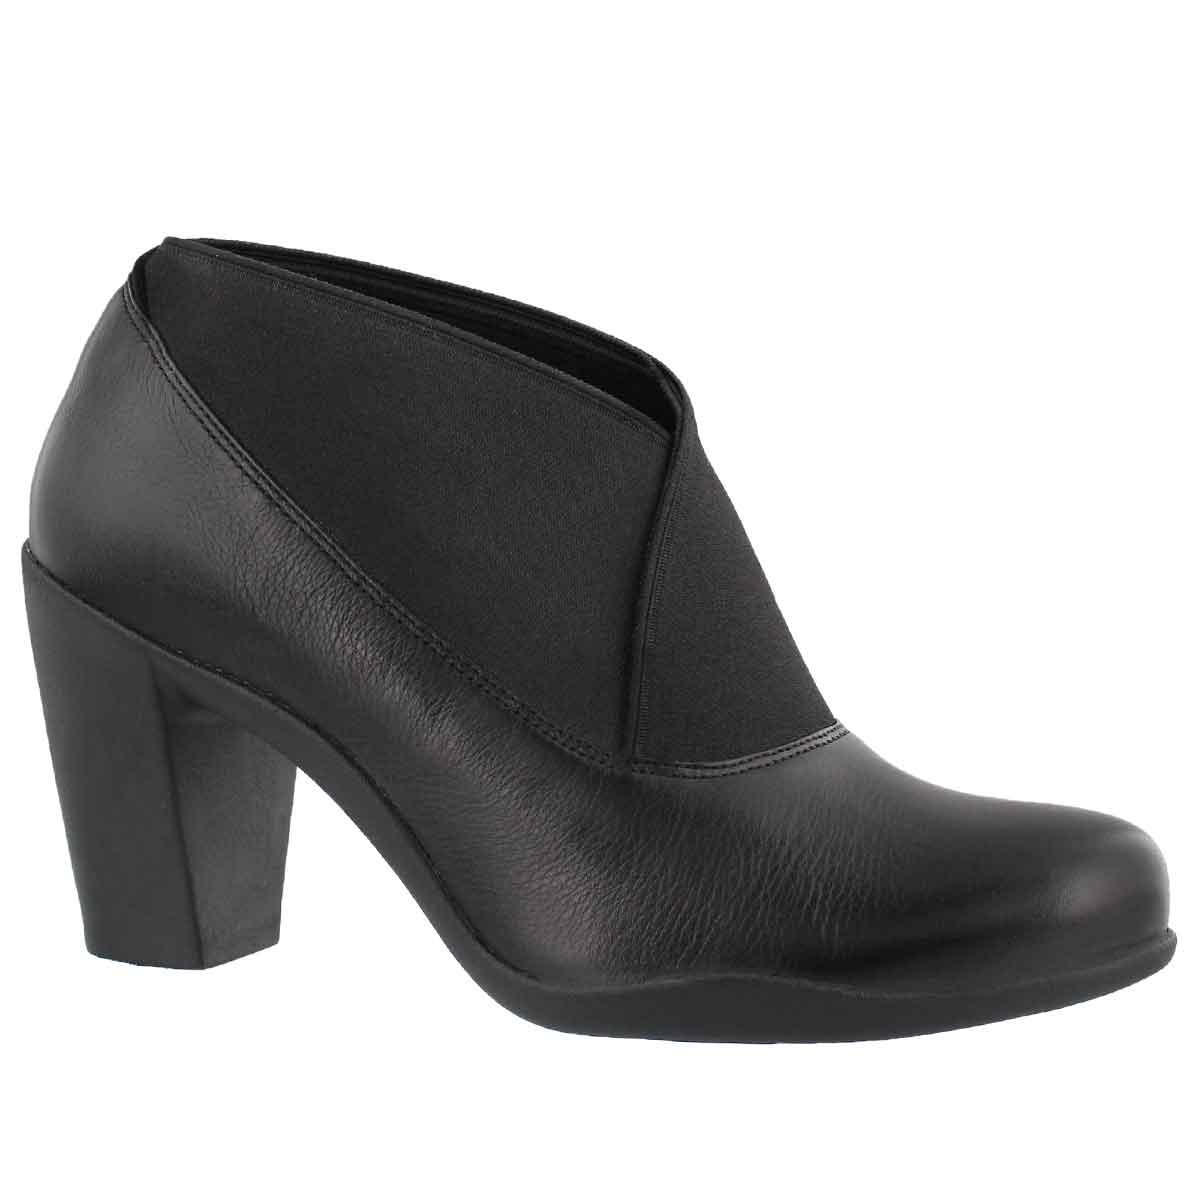 Women's ADYA LUNA black leather dress heels